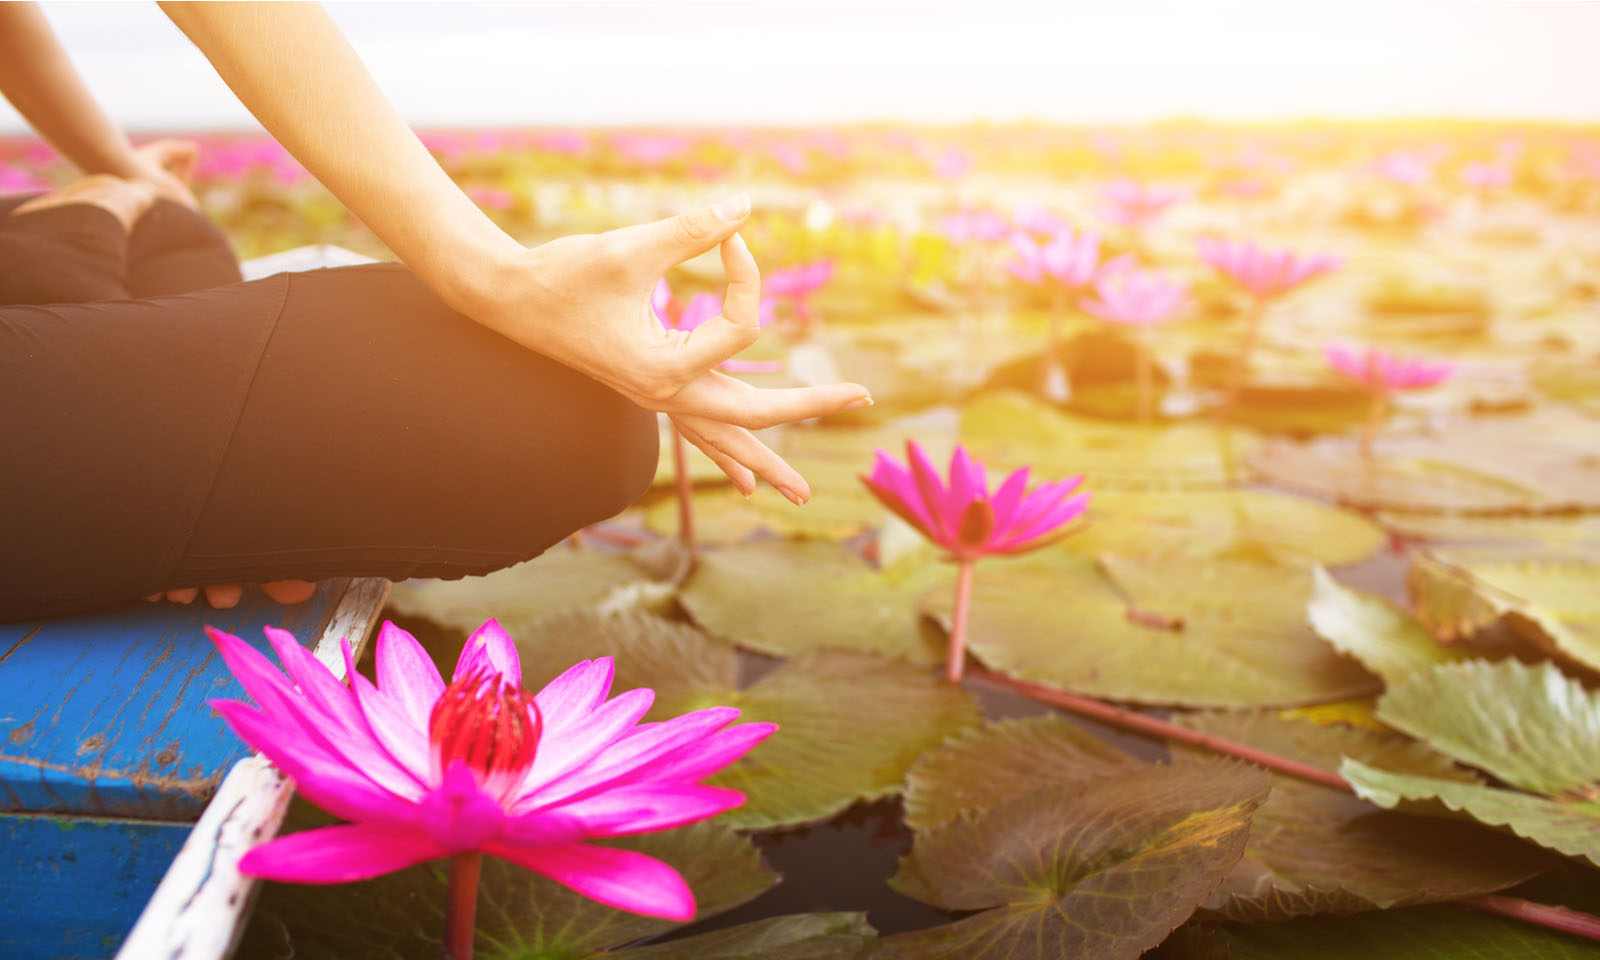 lily pads, meditation, wellness, silence, nature